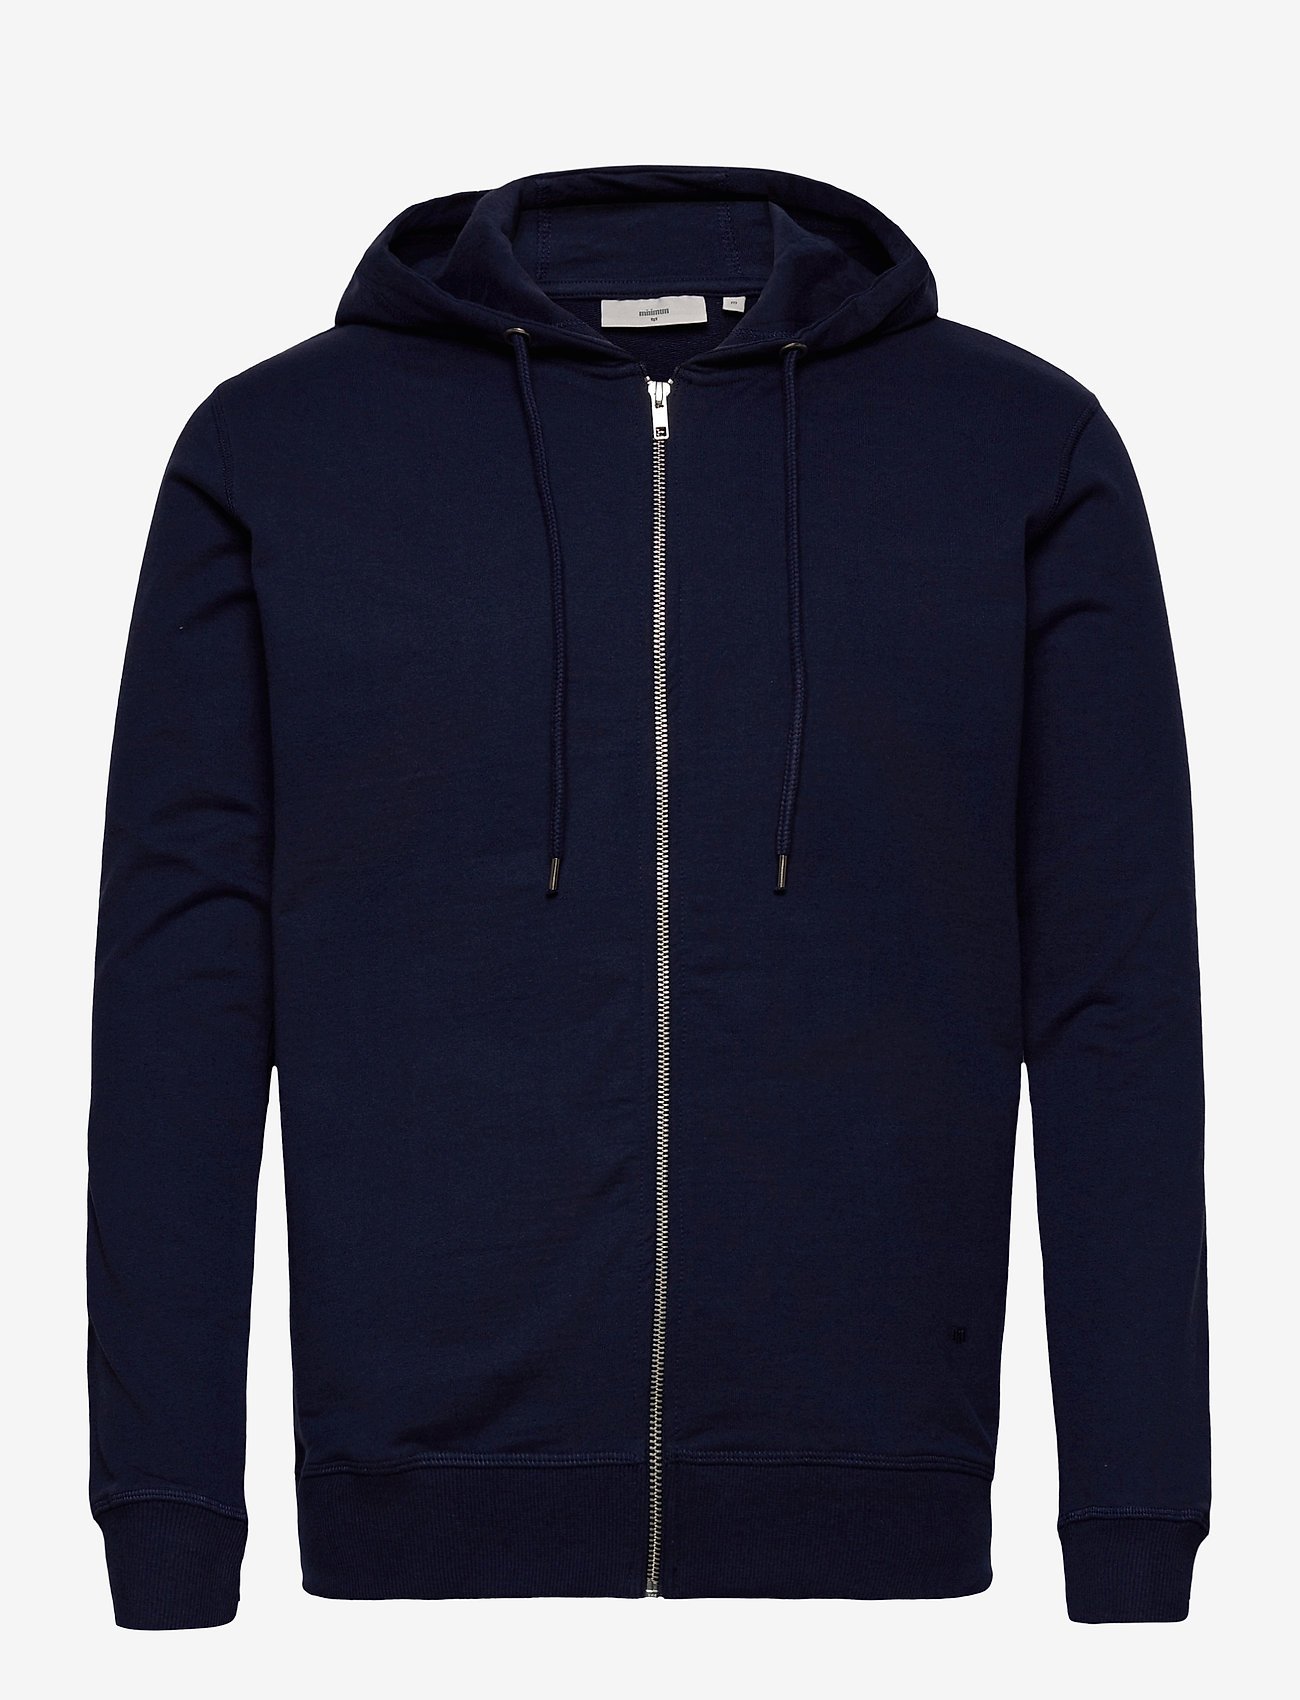 Minimum - ville - hoodies - dark saphire - 0